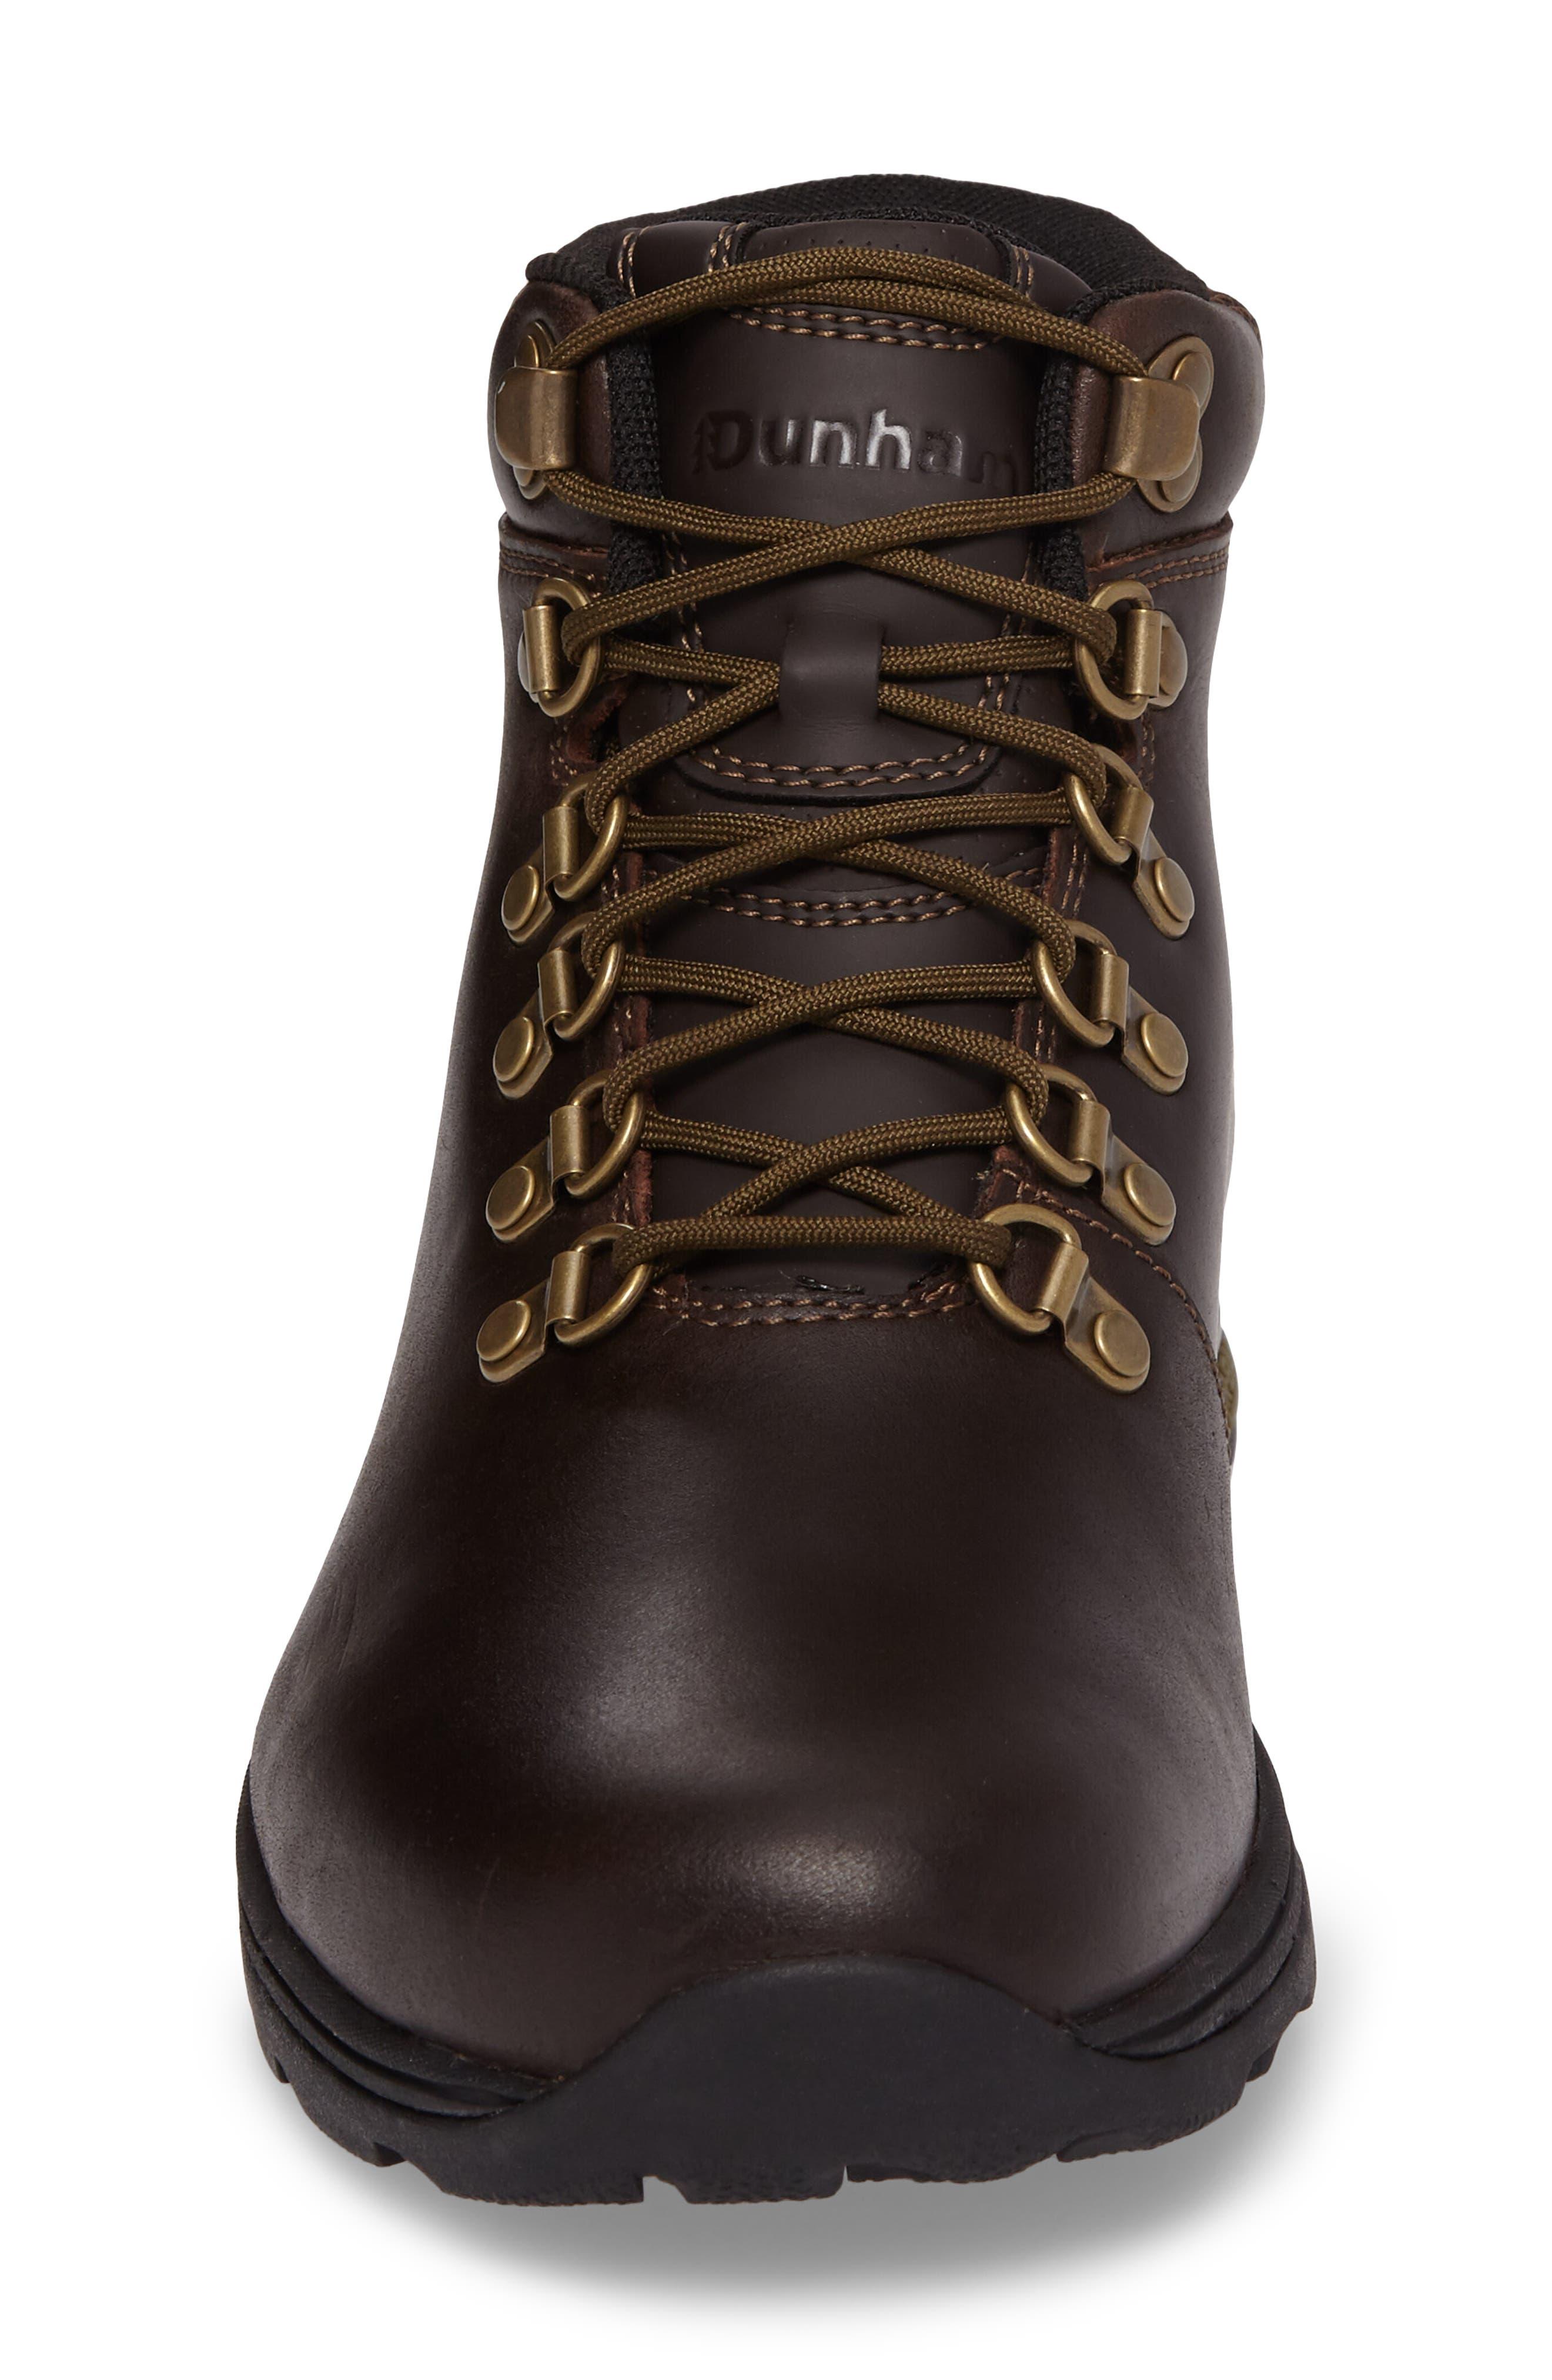 Trukka Waterproof Boot,                             Alternate thumbnail 4, color,                             Brown